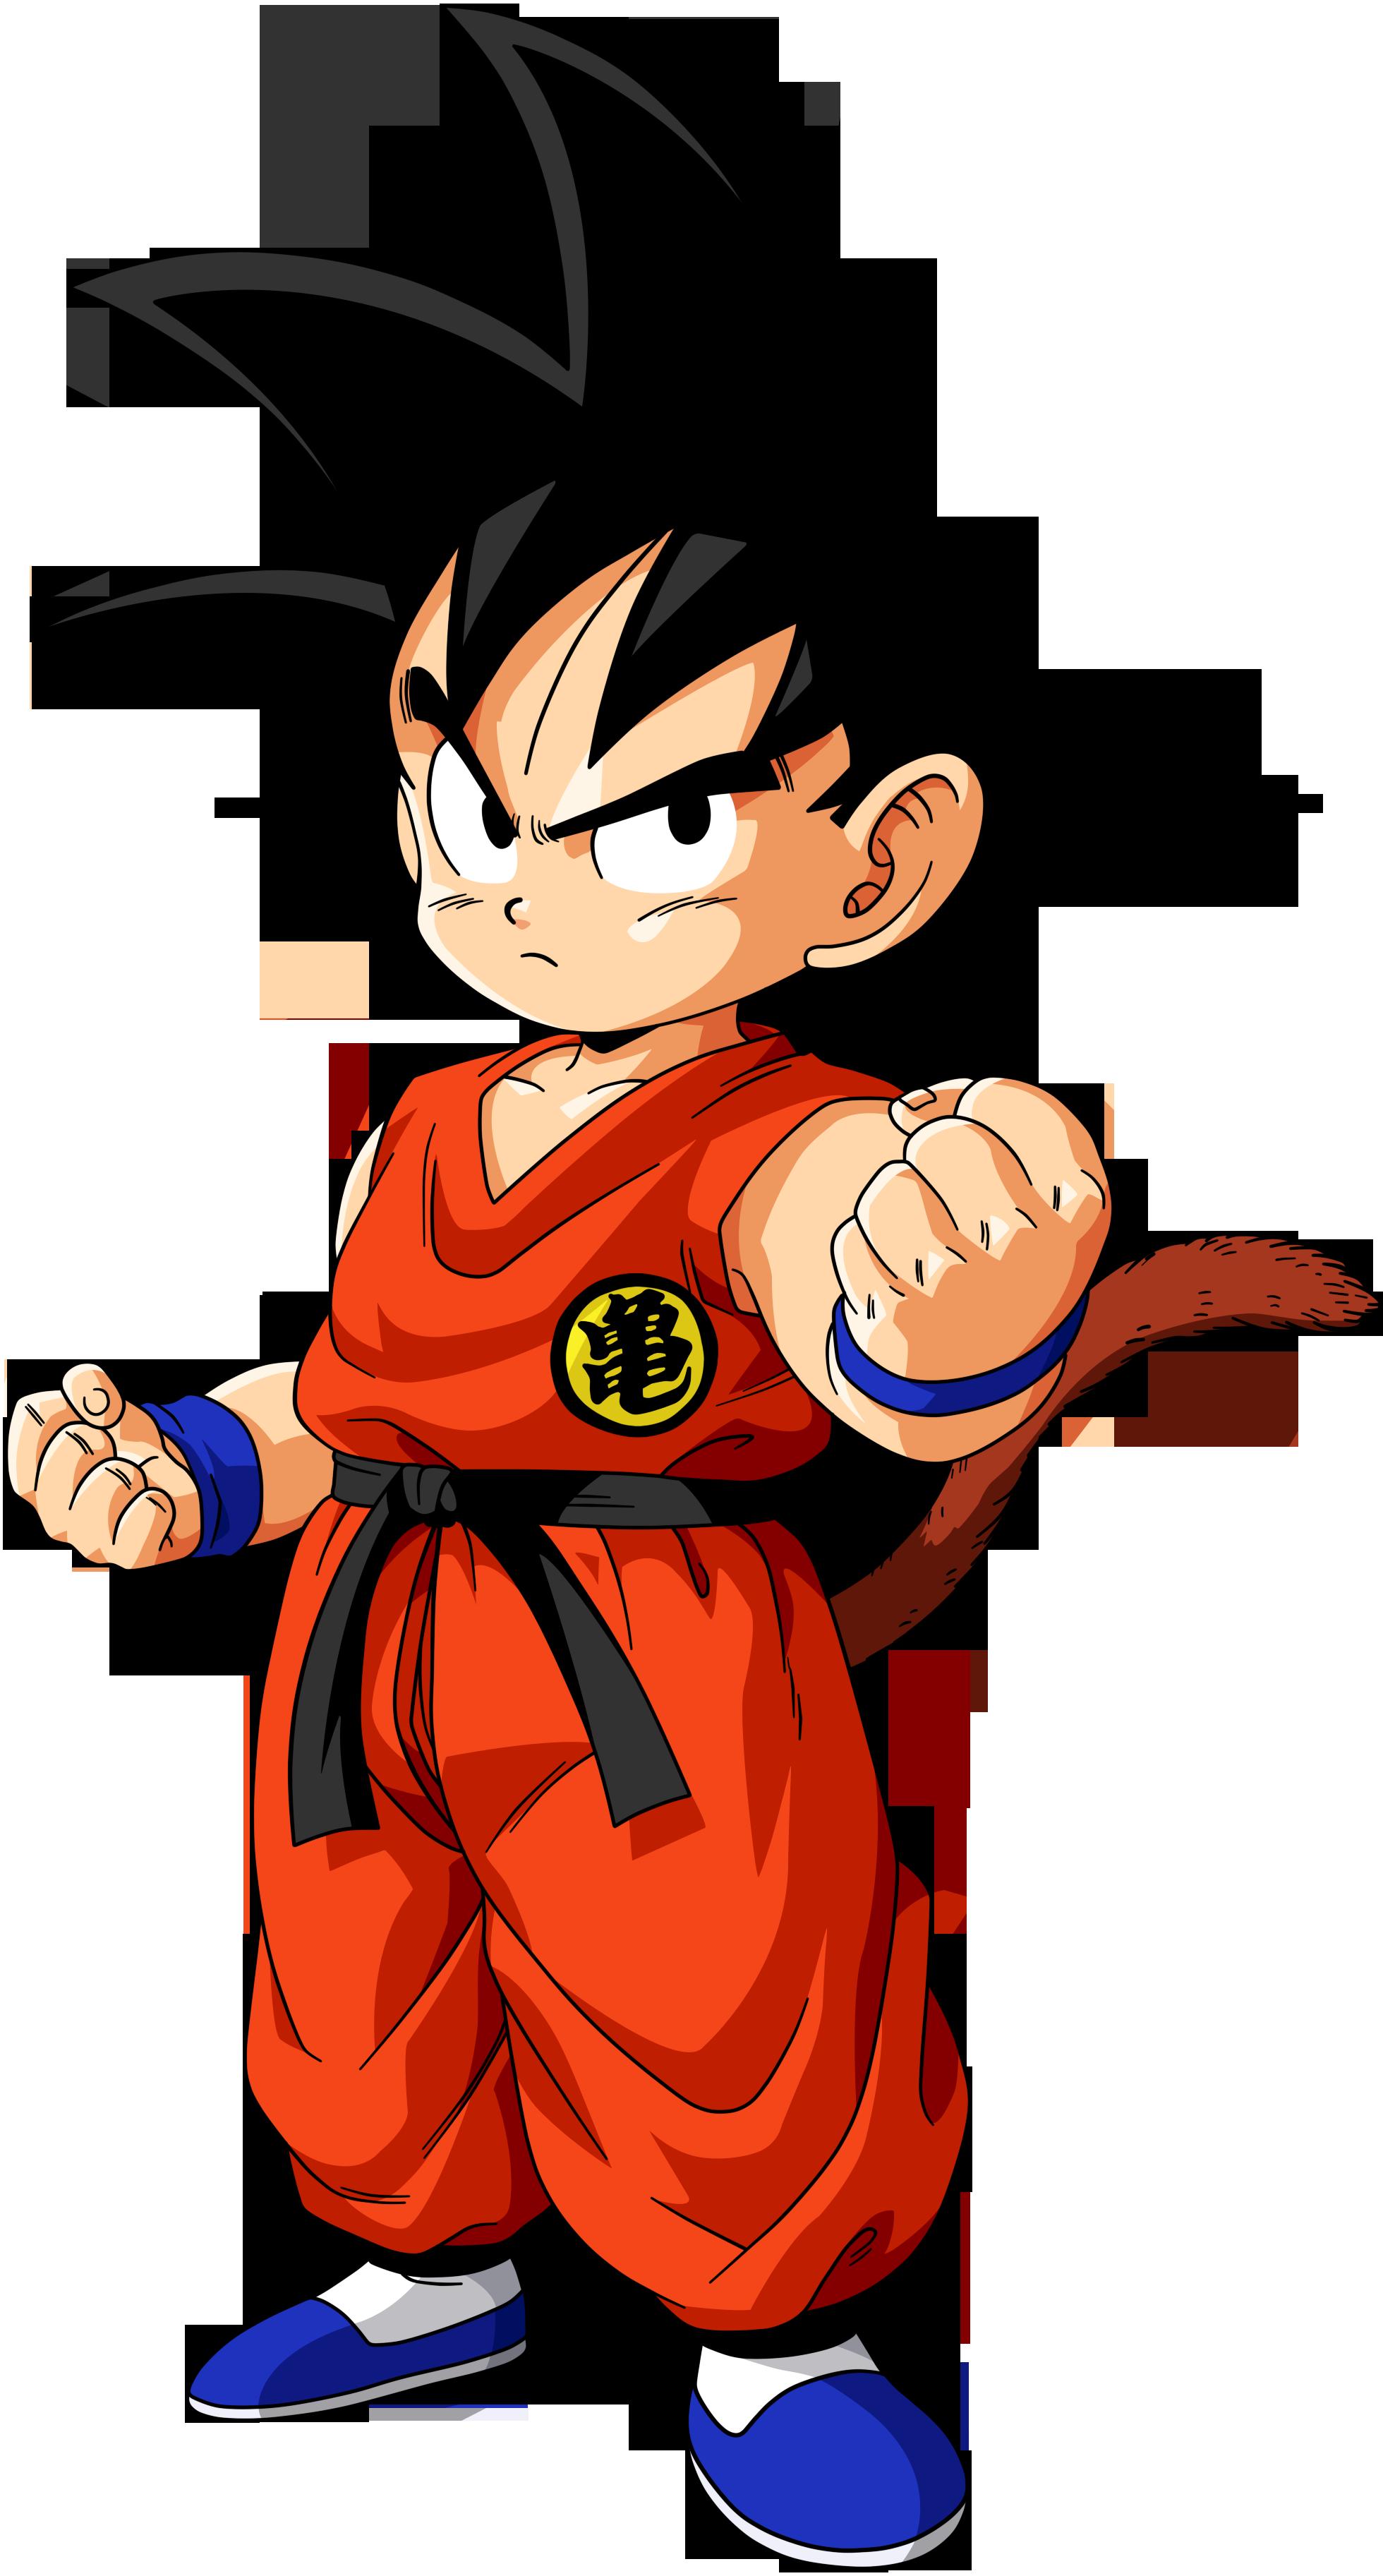 Dragon ball kid goku 21 by superjmanplay2 d5roz2f